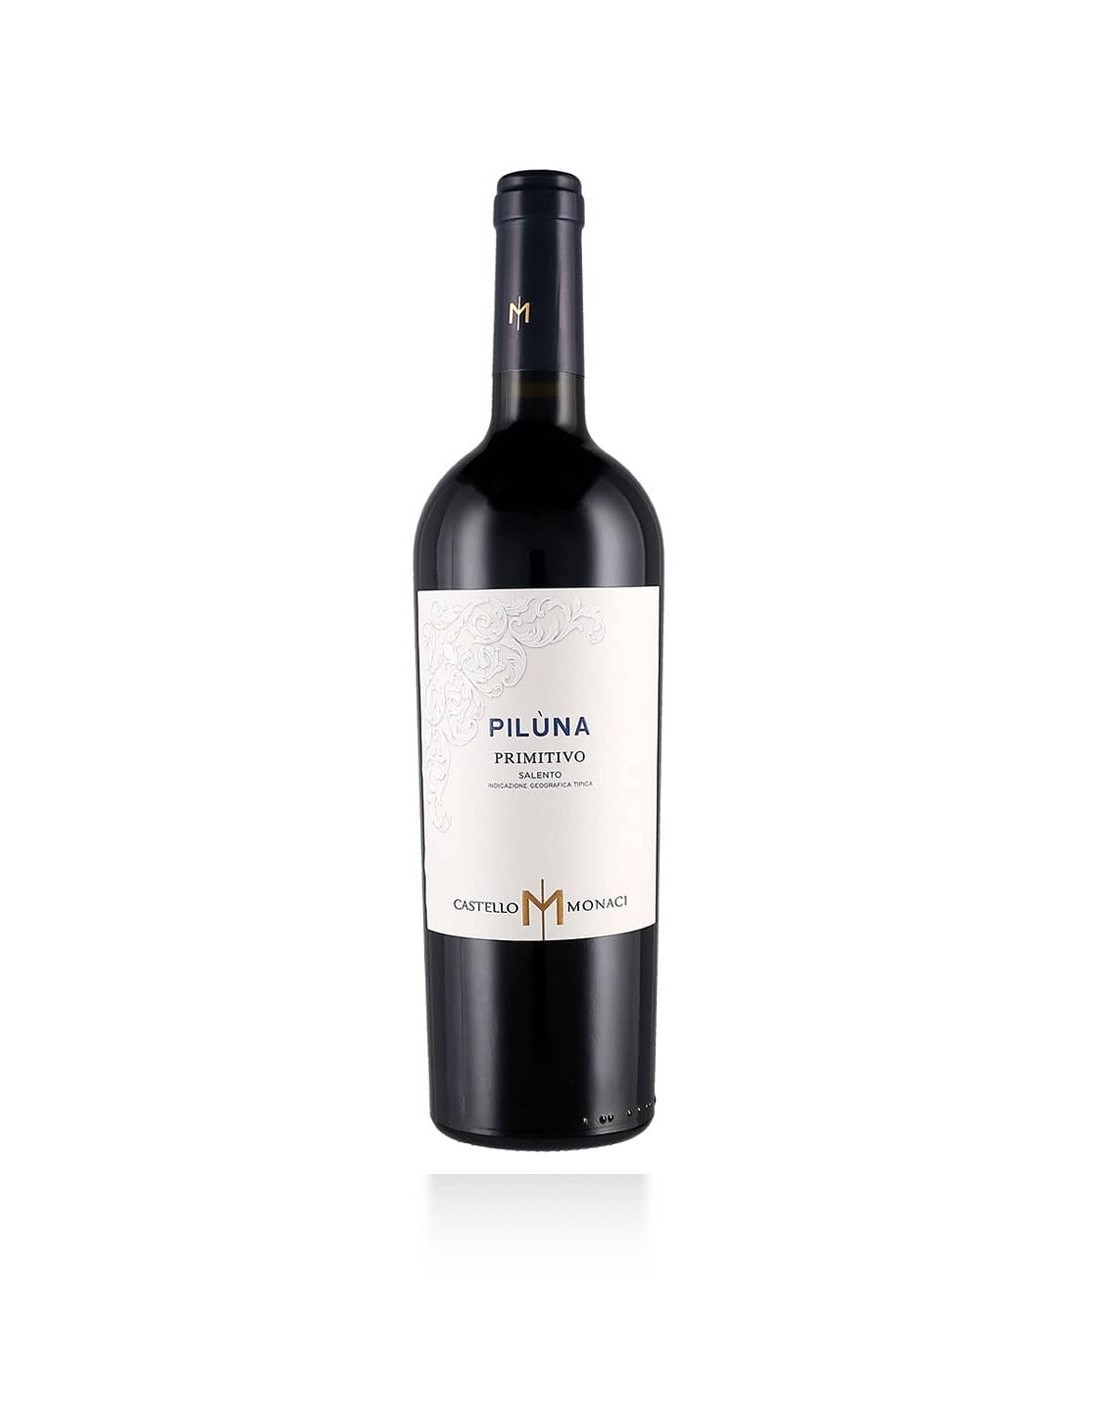 Vin rosu, Primitivo, Pilùna Salento, 0.75L, 14% alc., Italia